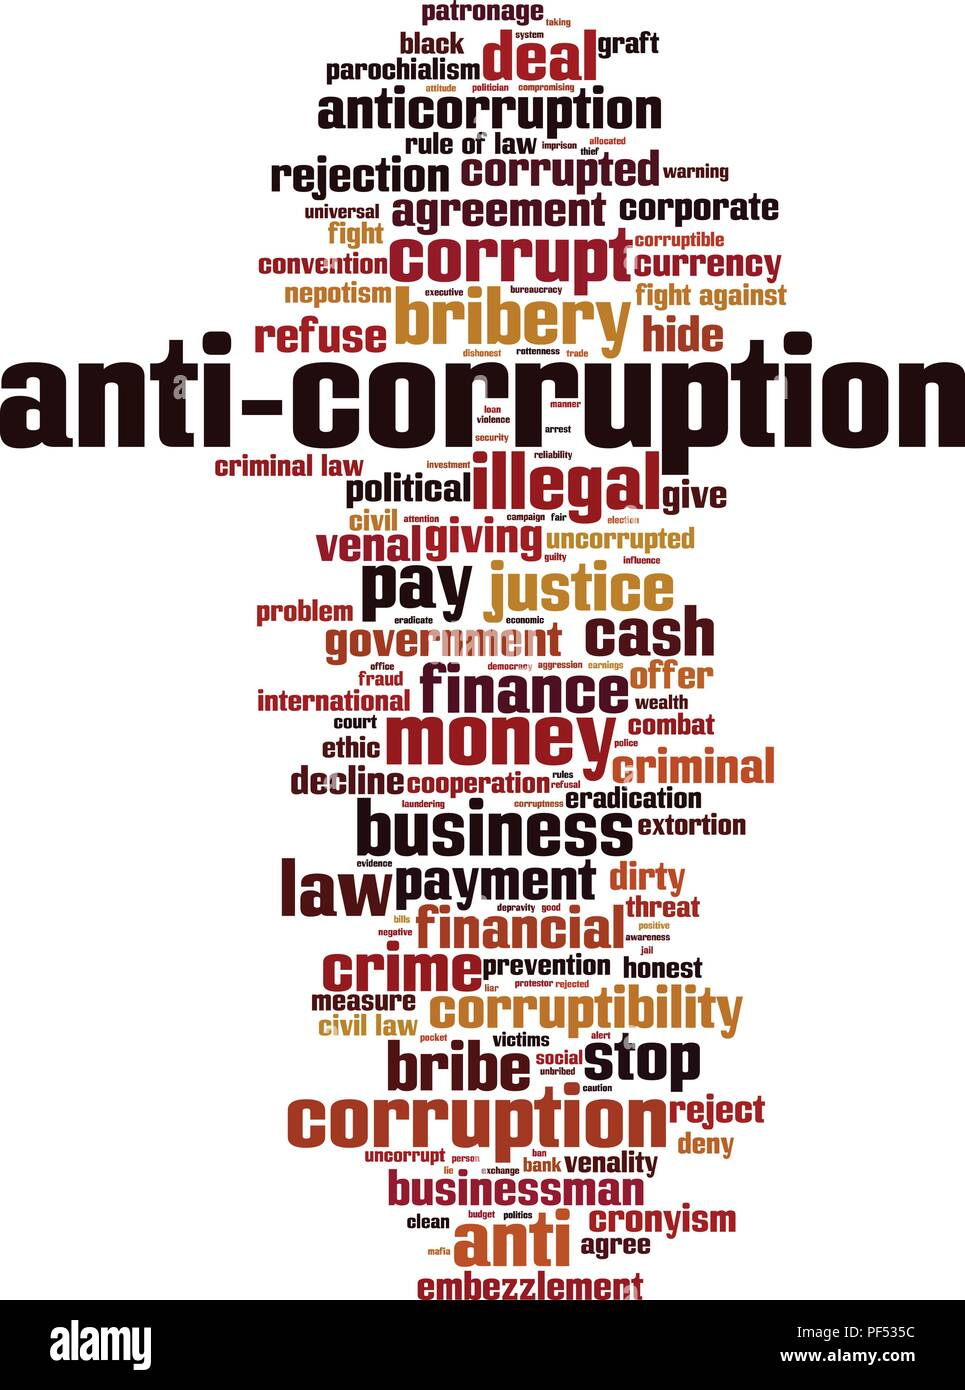 Anti-corruption word cloud concept. Vector illustration Stock Vector